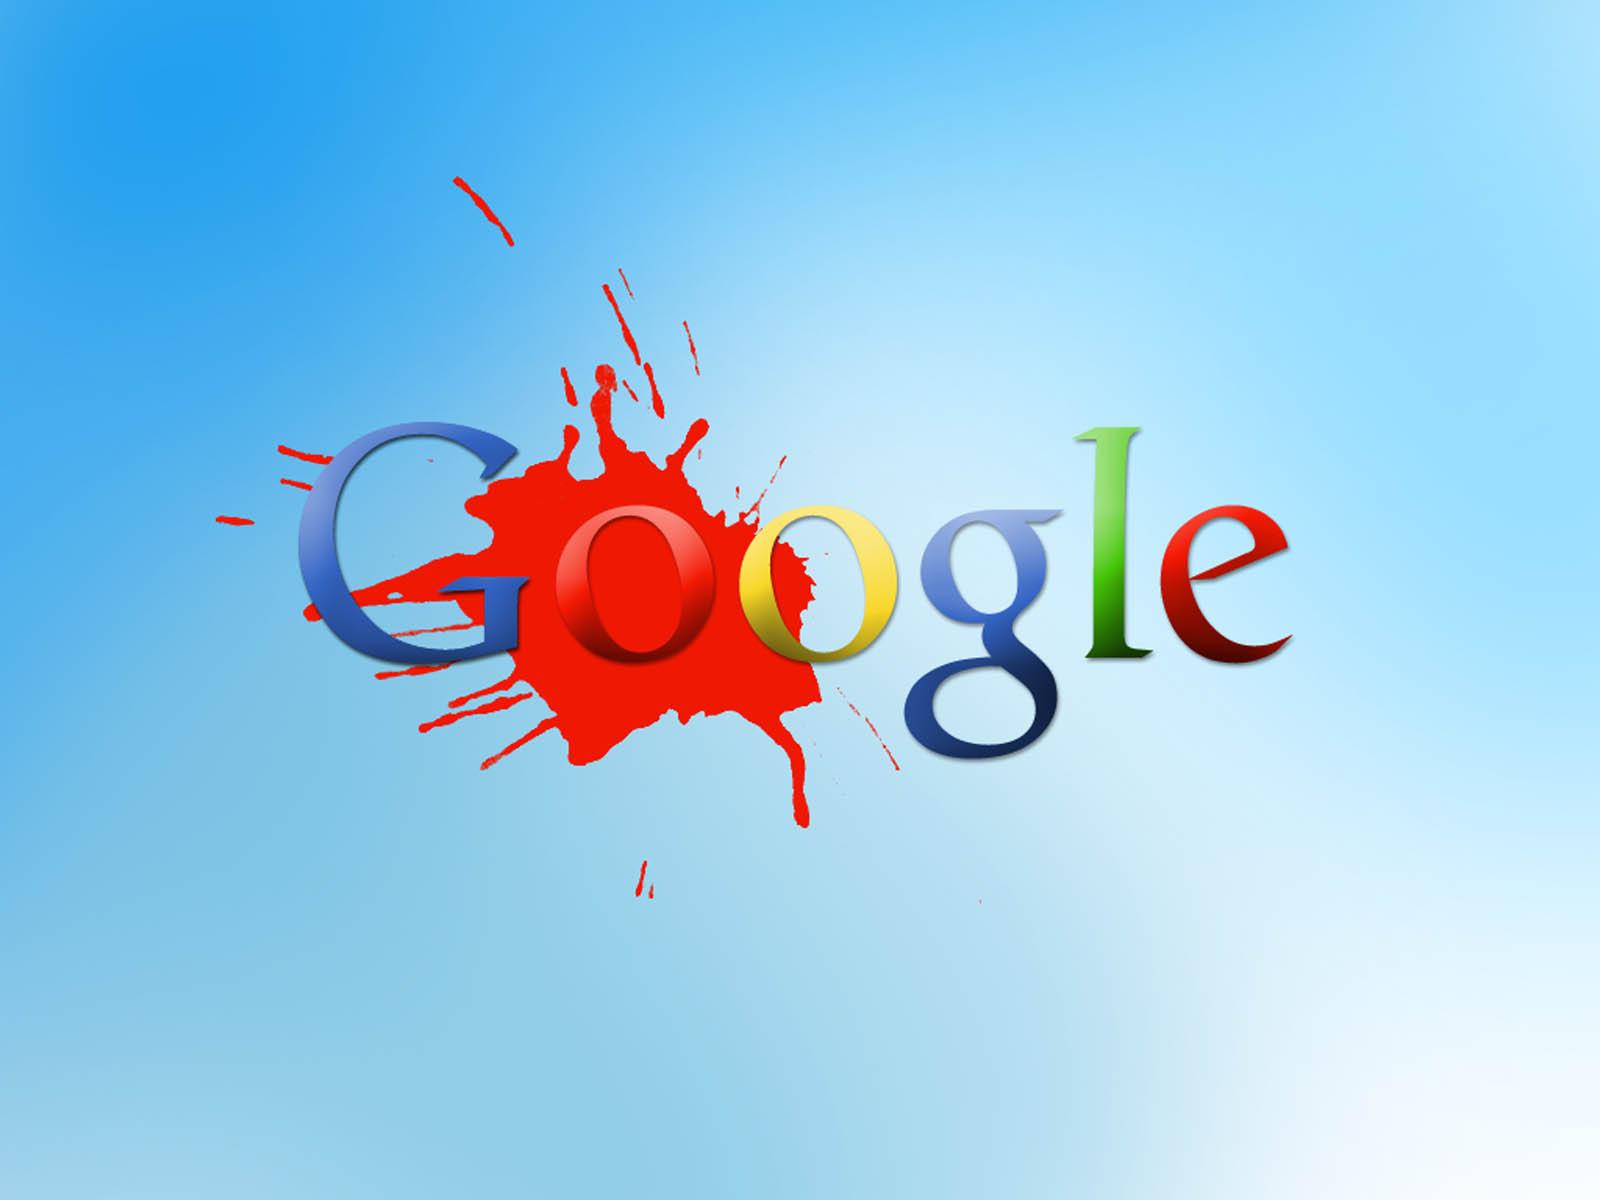 wallpapers: Google Desktop Backgrounds And Wallpapers